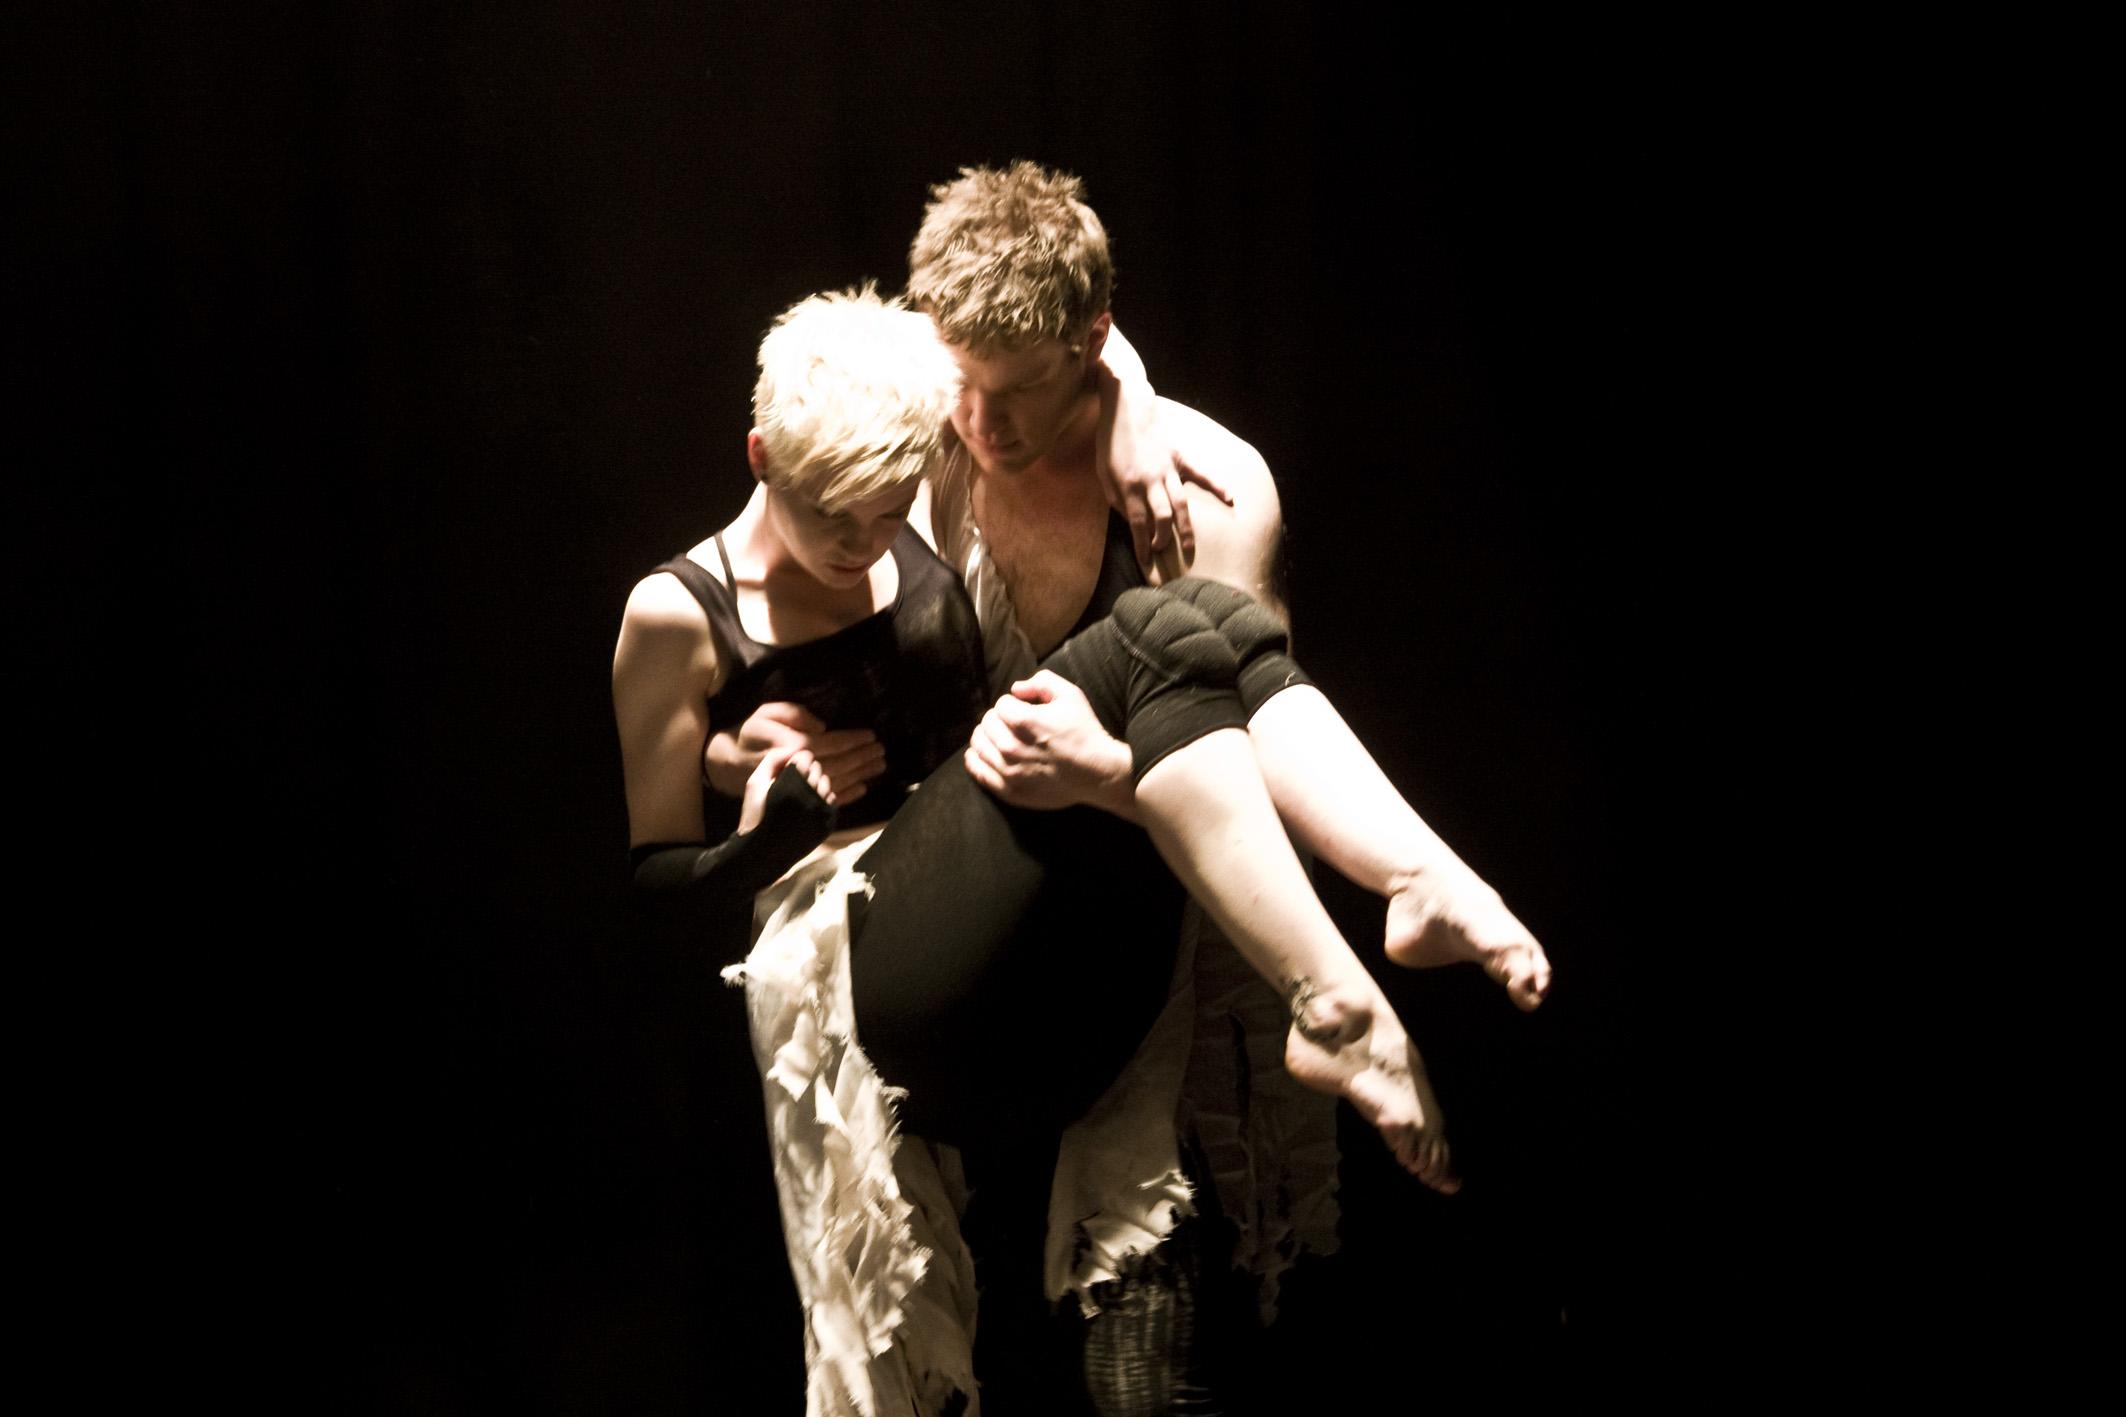 http://www.danceahead.co.uk/wp-content/uploads/2018/05/ATBOR10.jpg